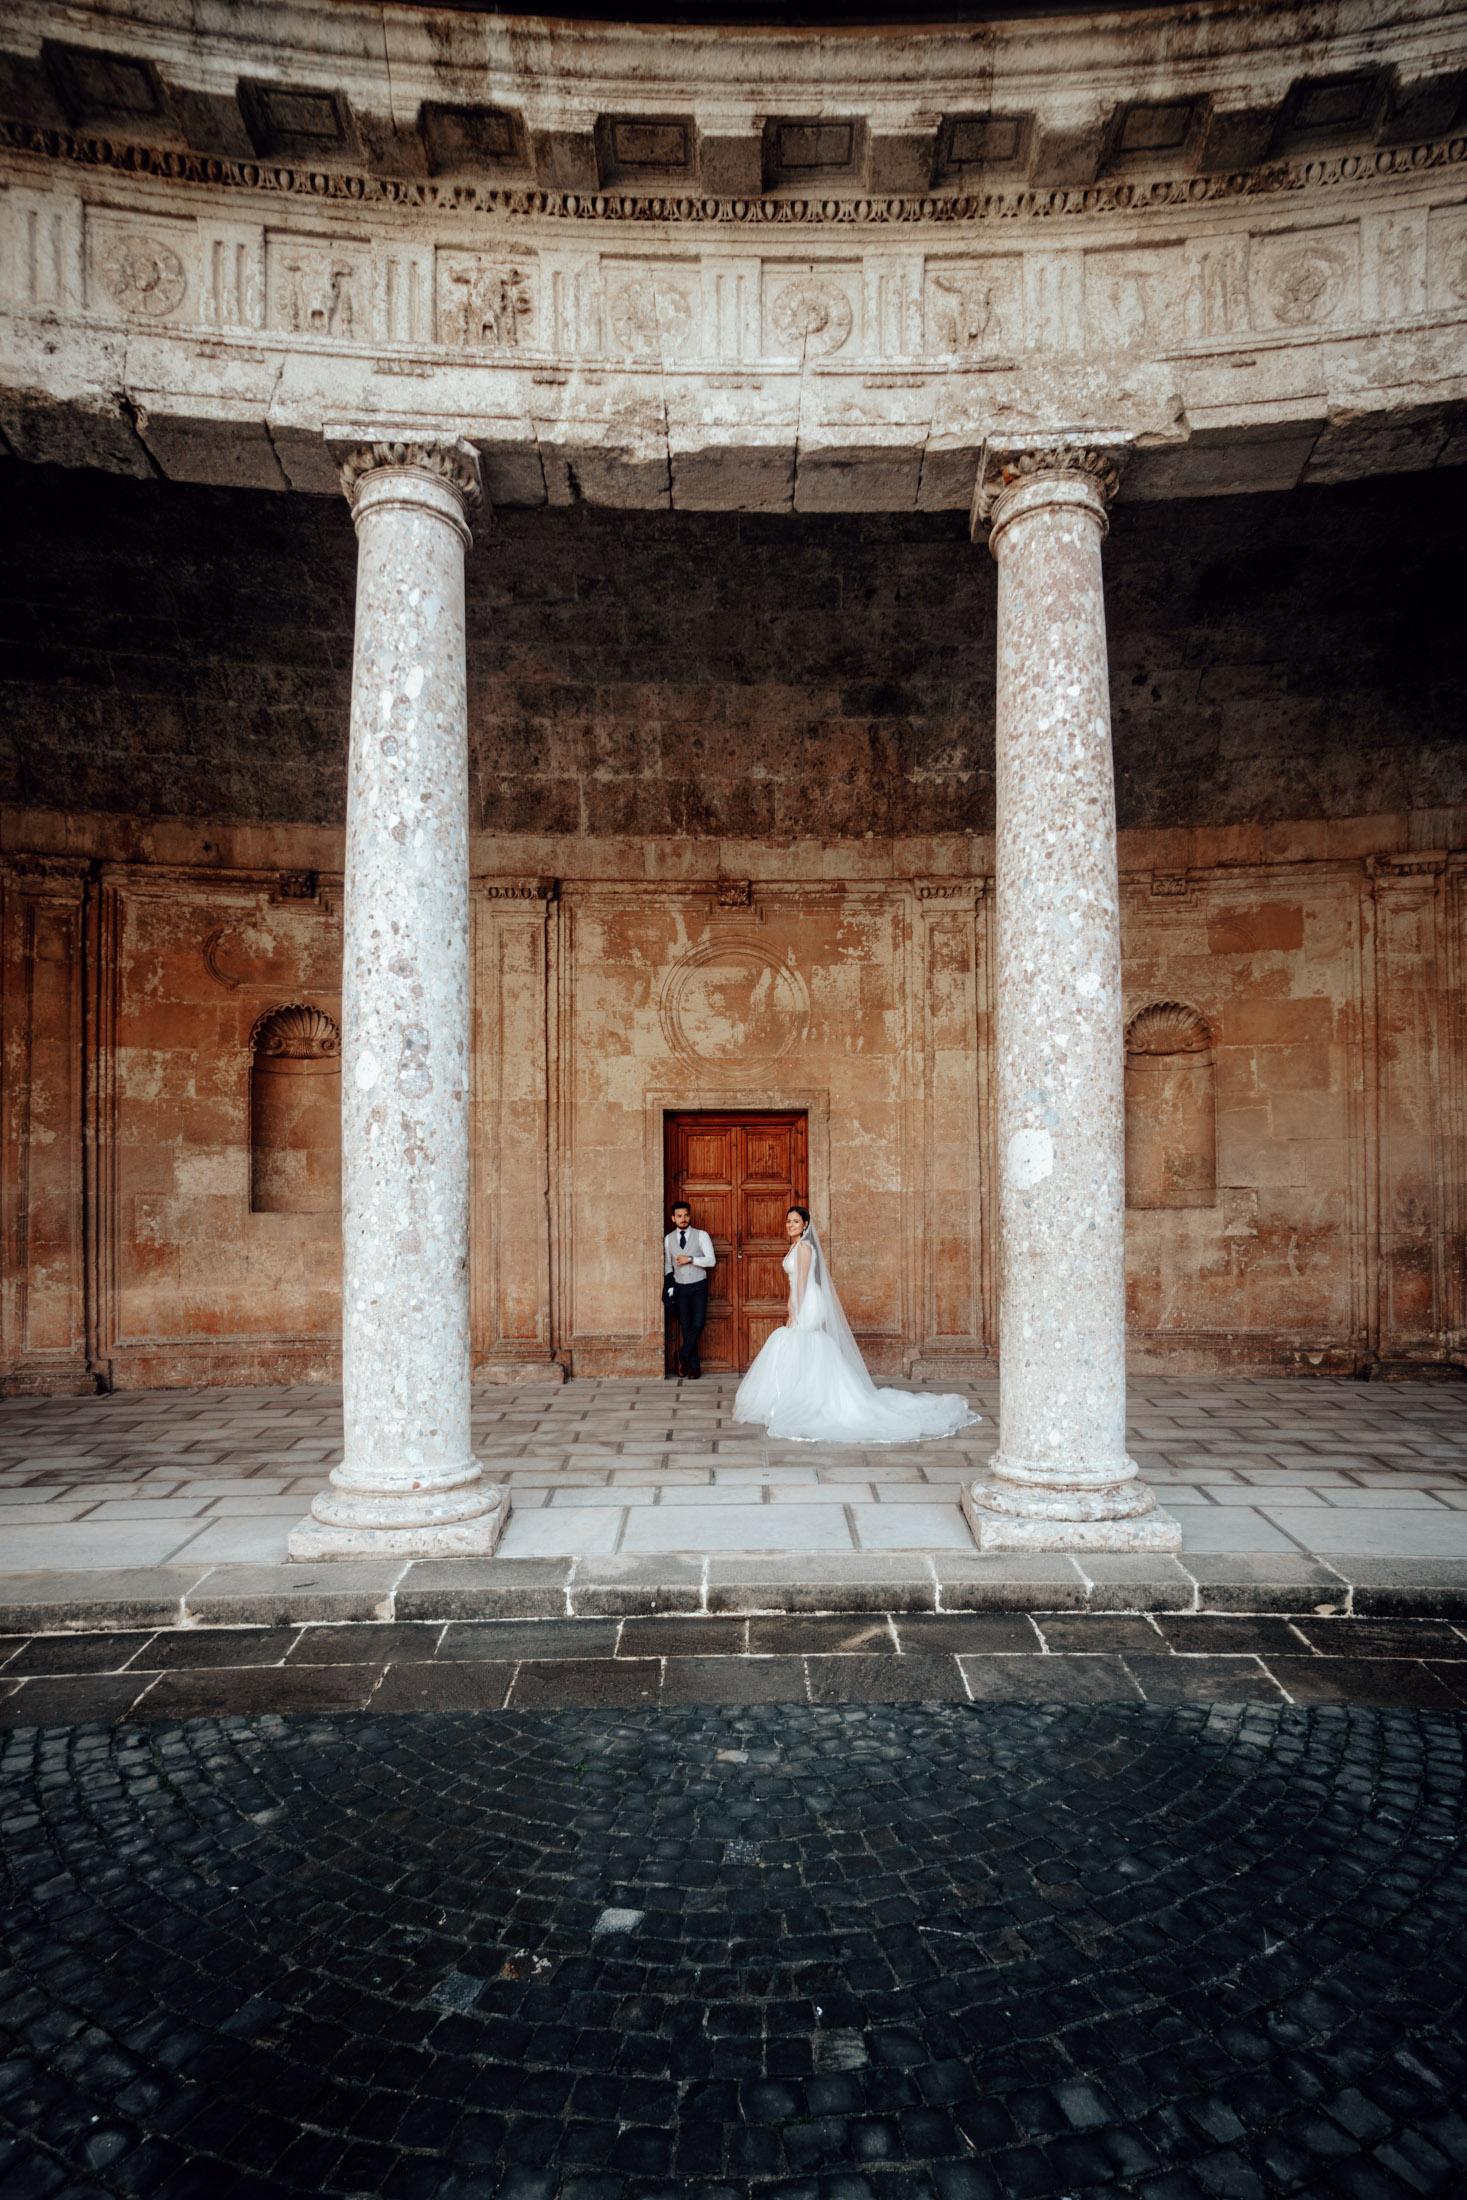 Wedding photographer in Alhambra